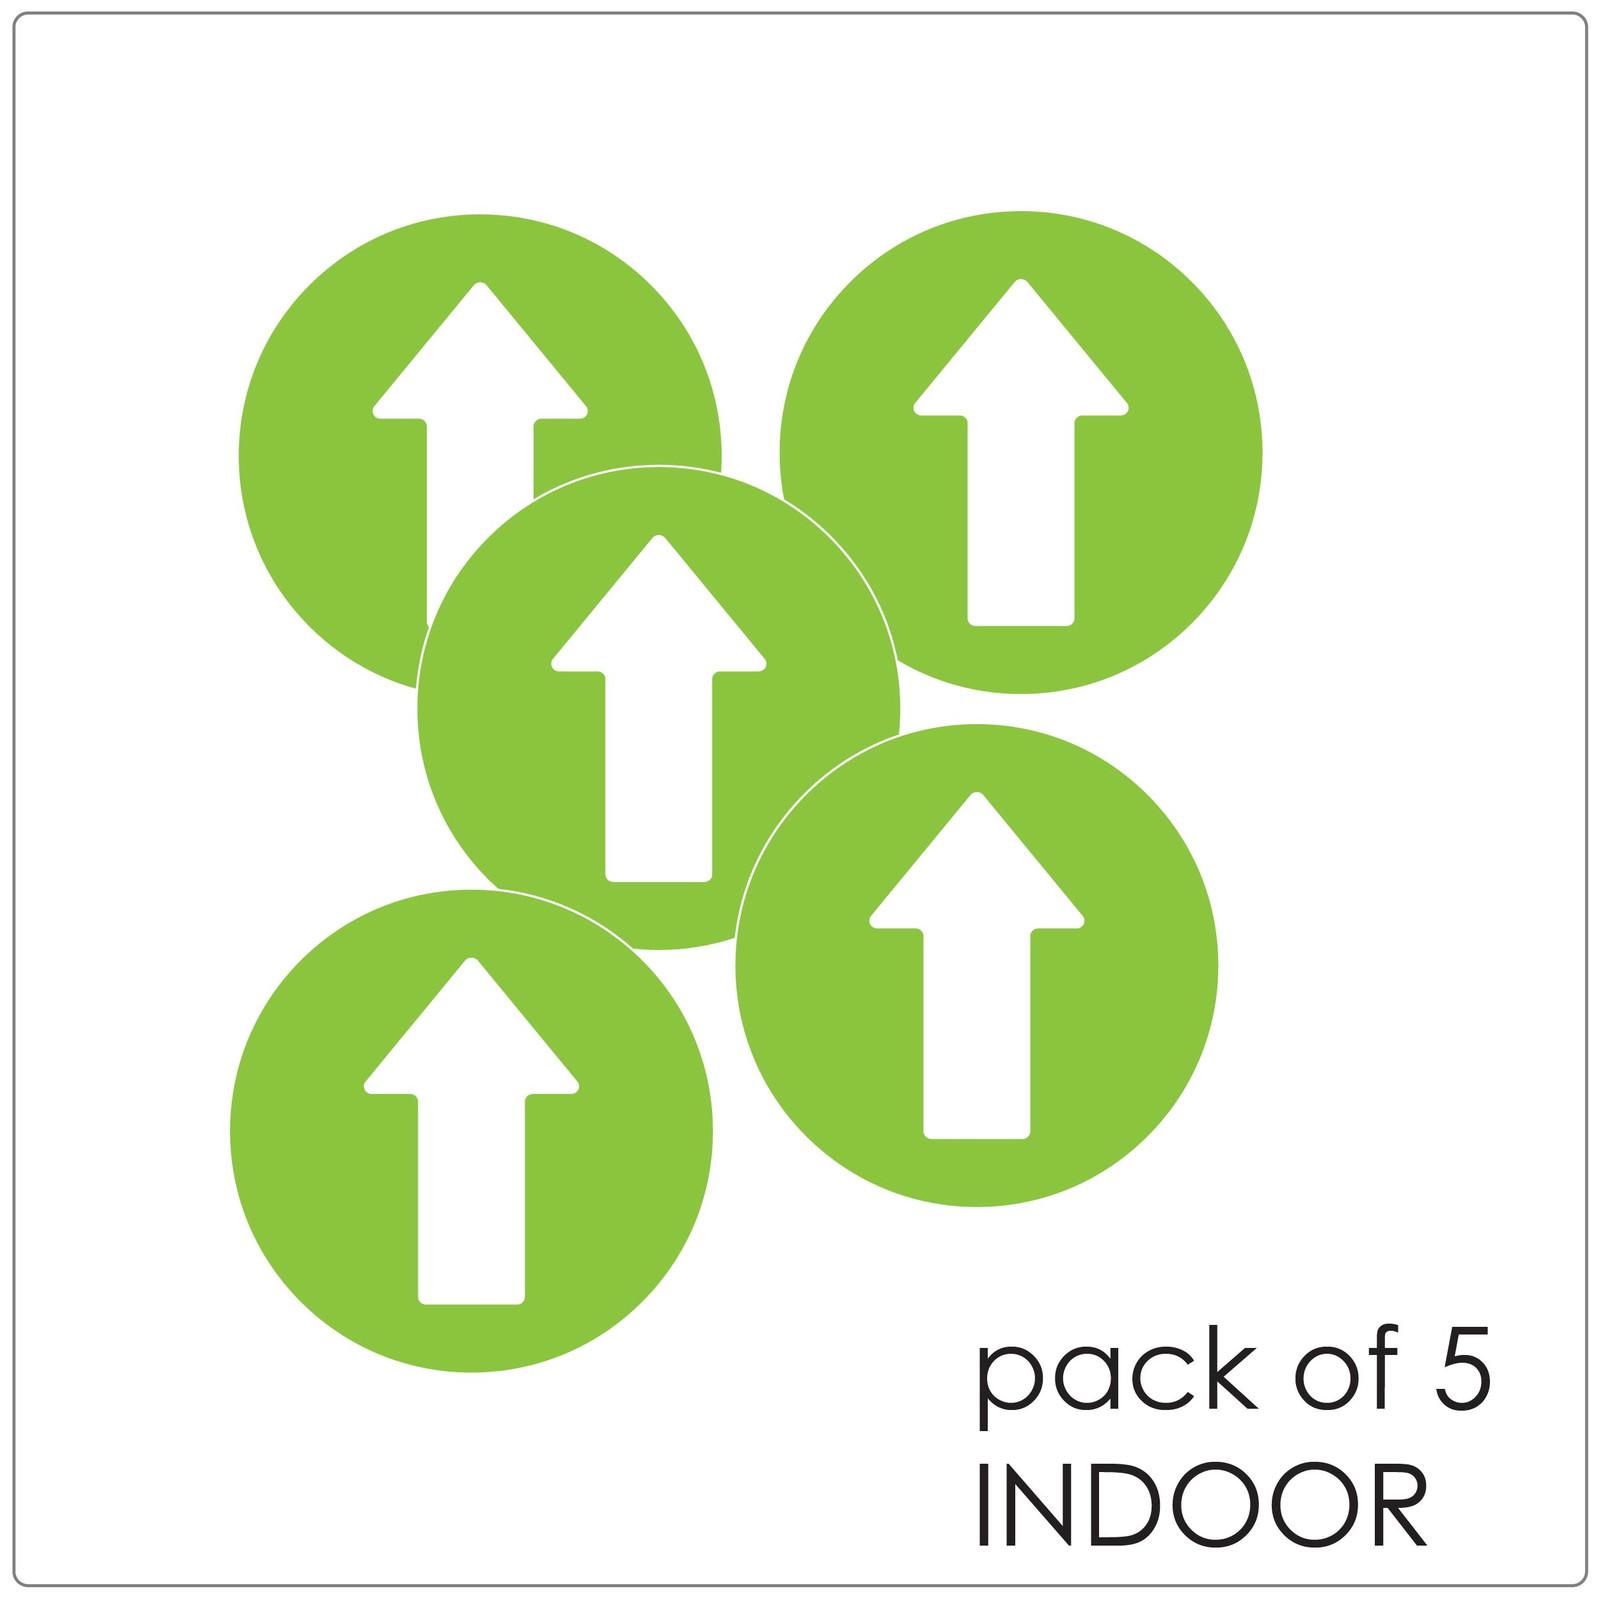 directional arrow social distancing floor sticker for hard floors, pack of 5, green Self-adhesive Corona virus floor sticker to help with traffic flow